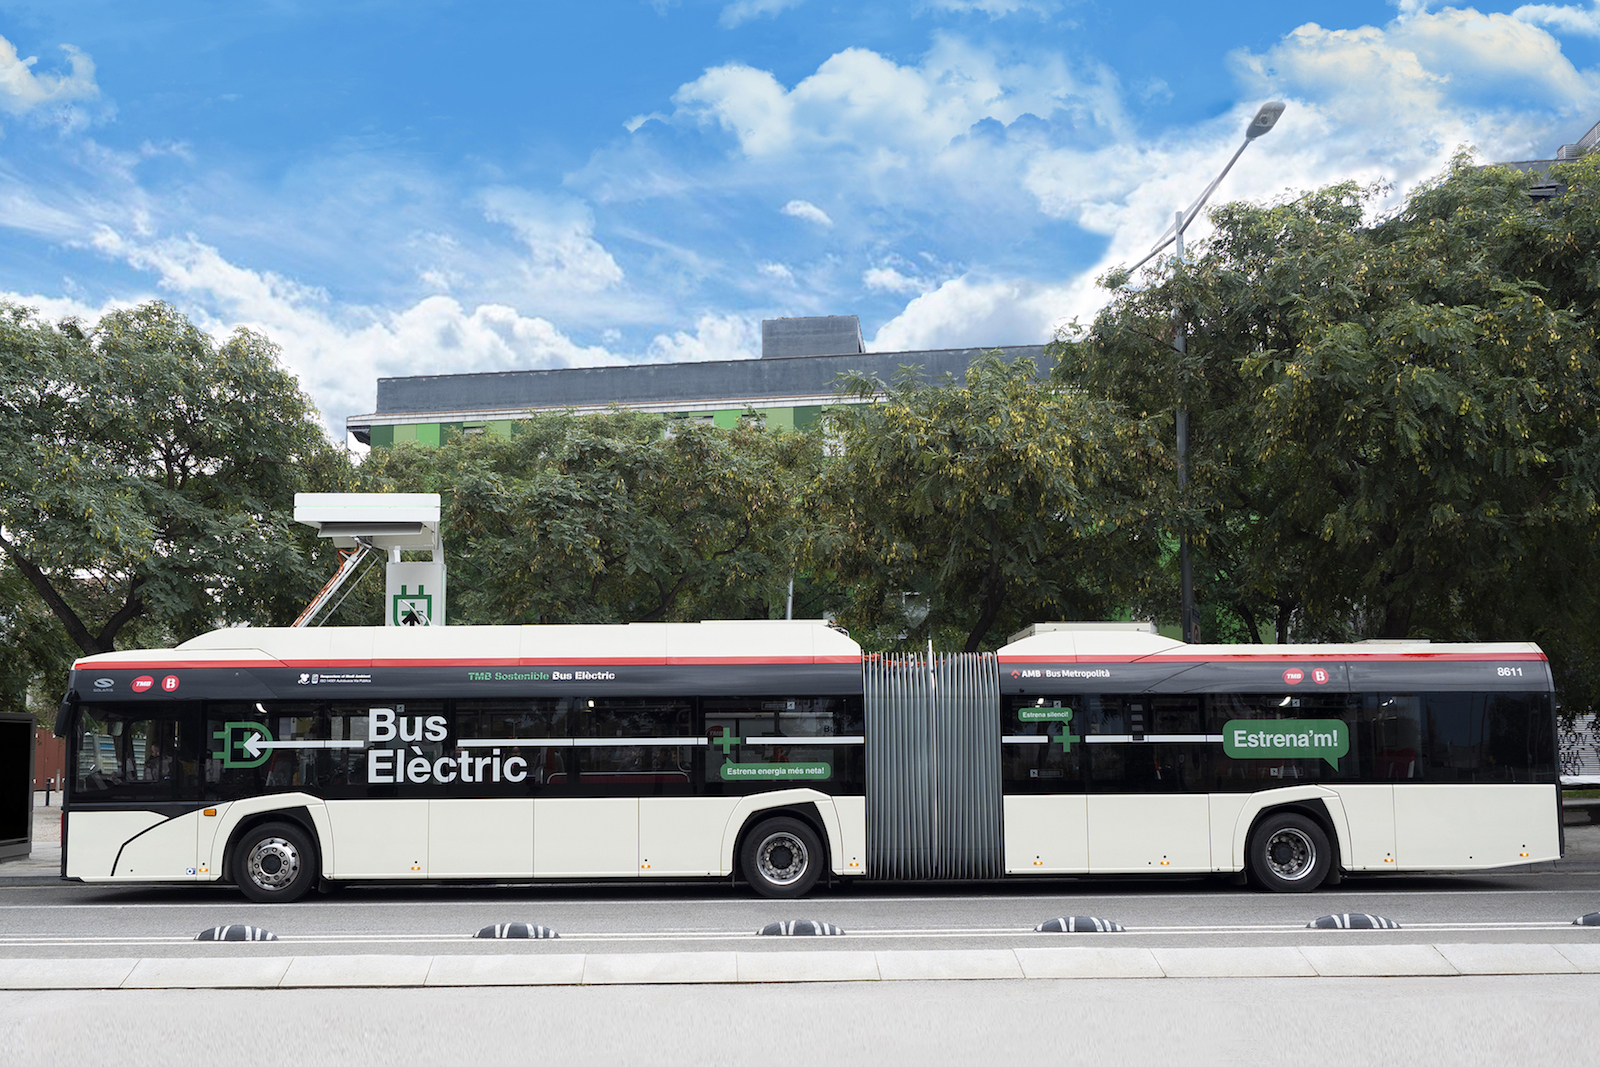 electric bus tmb barcelona